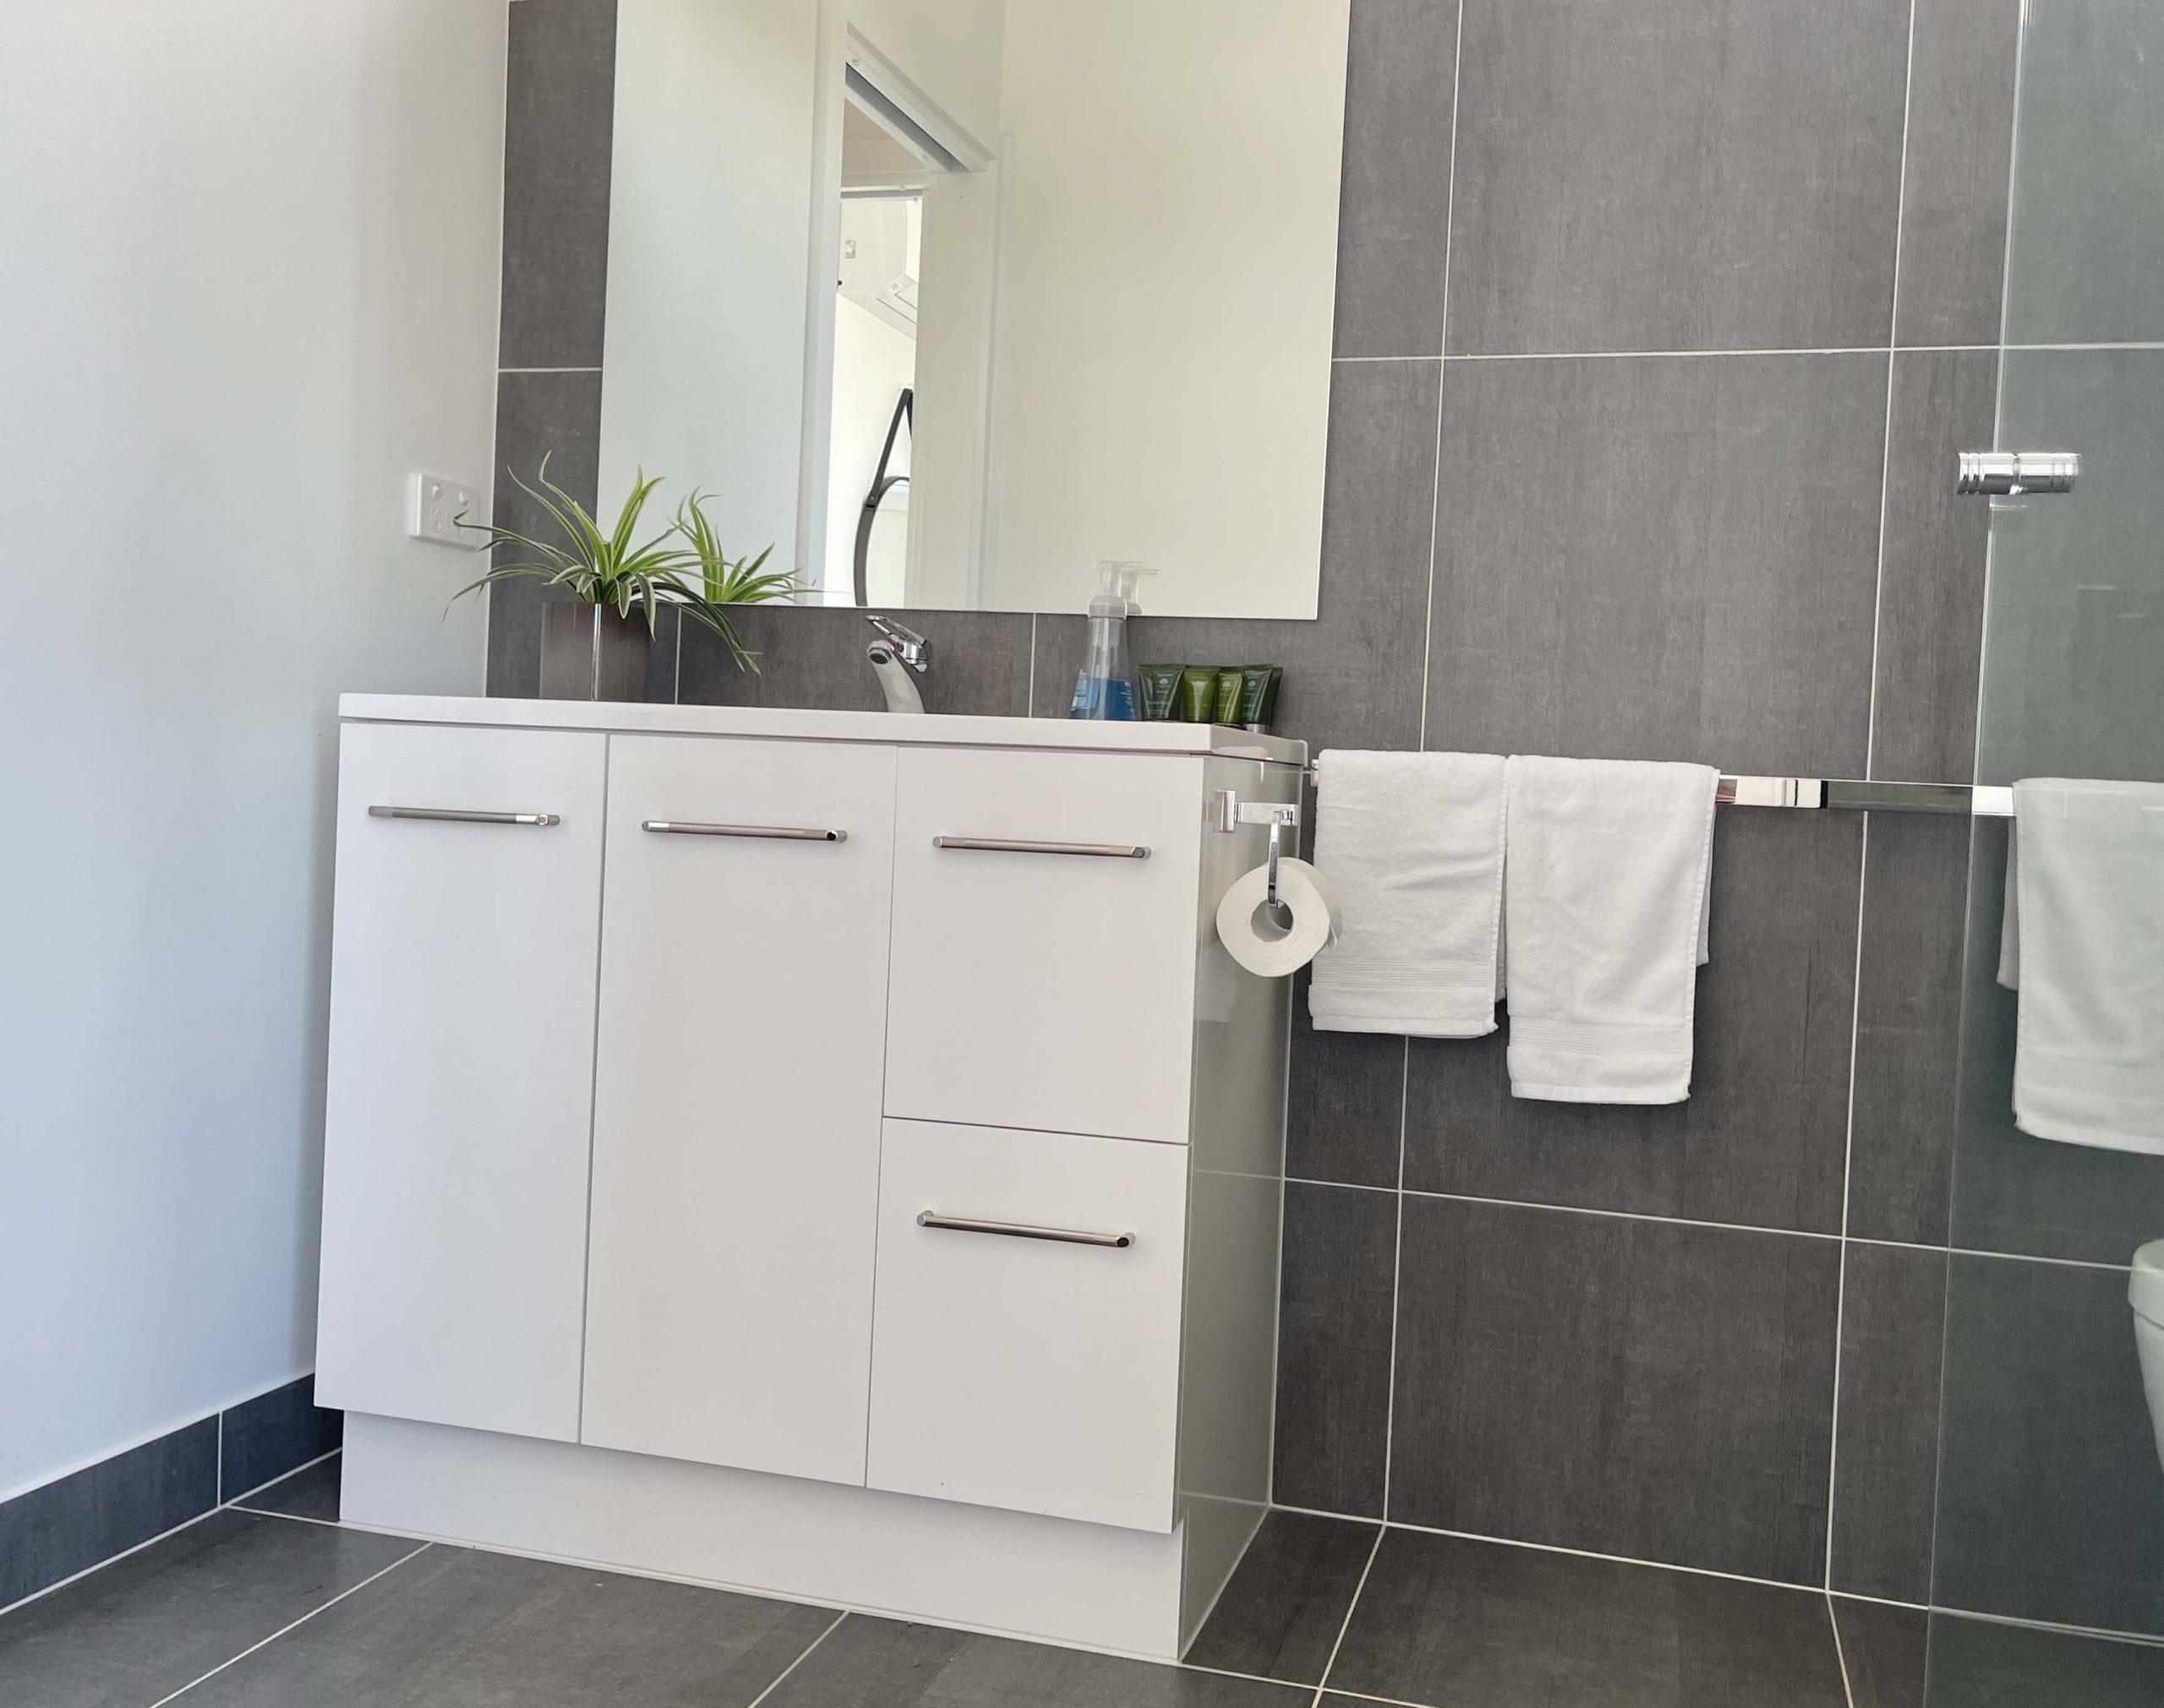 1BDR_Bathroom_1